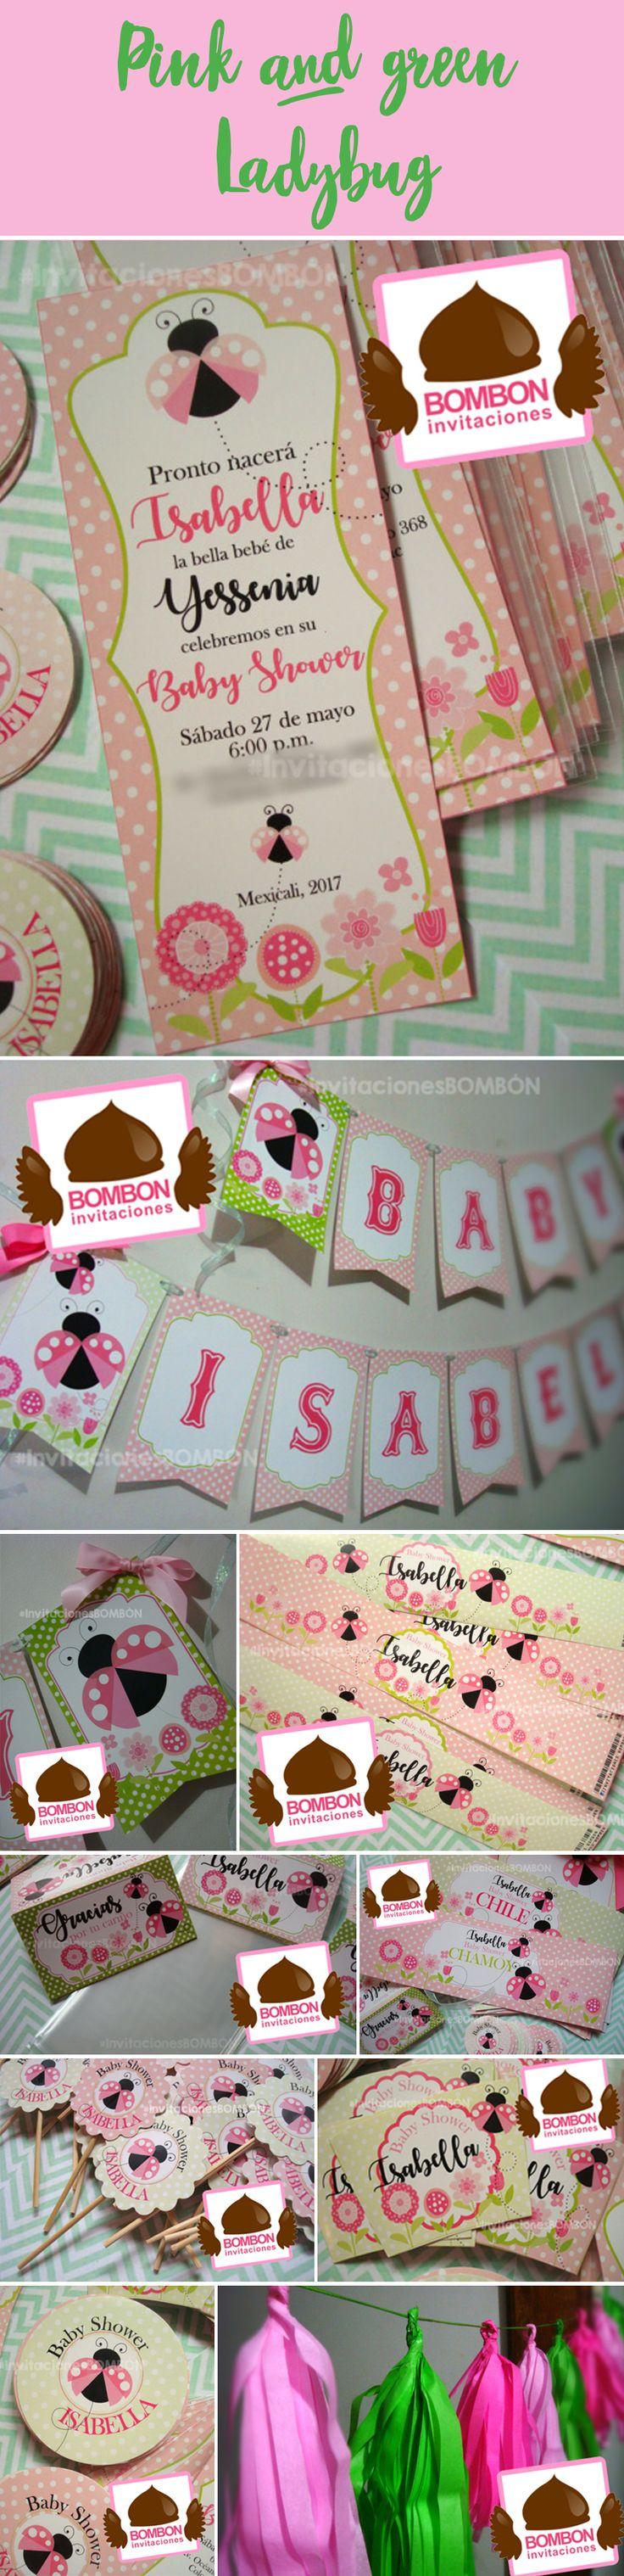 #Ladybug #catarina #babyshower #pink #green #babygirl #spring #flowers #baby #invitation #garland #waterlabel #favorbag #topper #stickers #tag #label #banner #mariquita #primavera #spring #cute #lindo #femenino #party #design #graphicdesign #InvitacionesBOMBON https://www.facebook.com/InvitacionesBOMBONLANDIA/